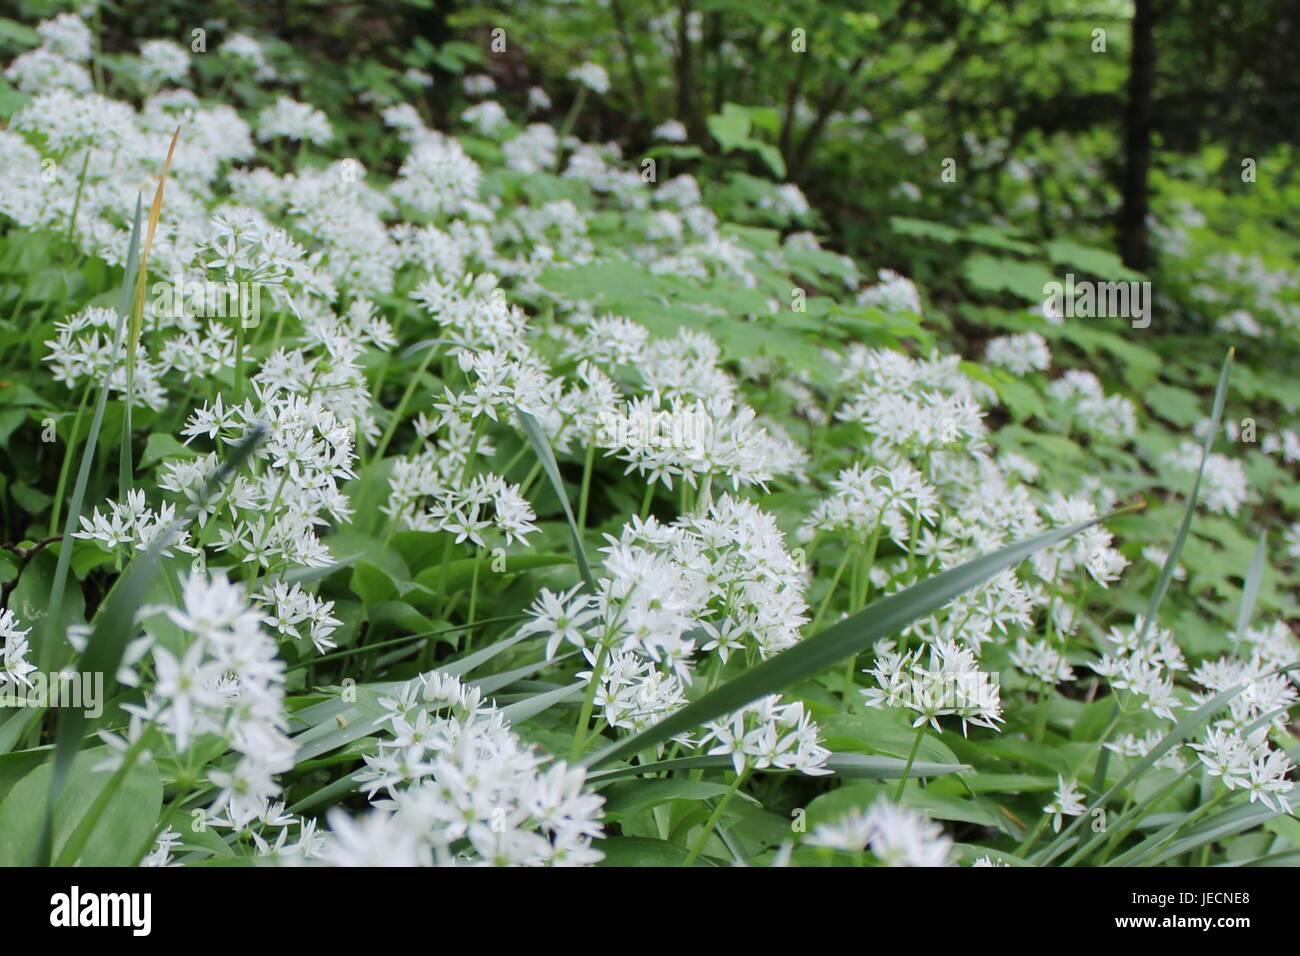 Allium Ursinum blüht im Mai. Stockbild